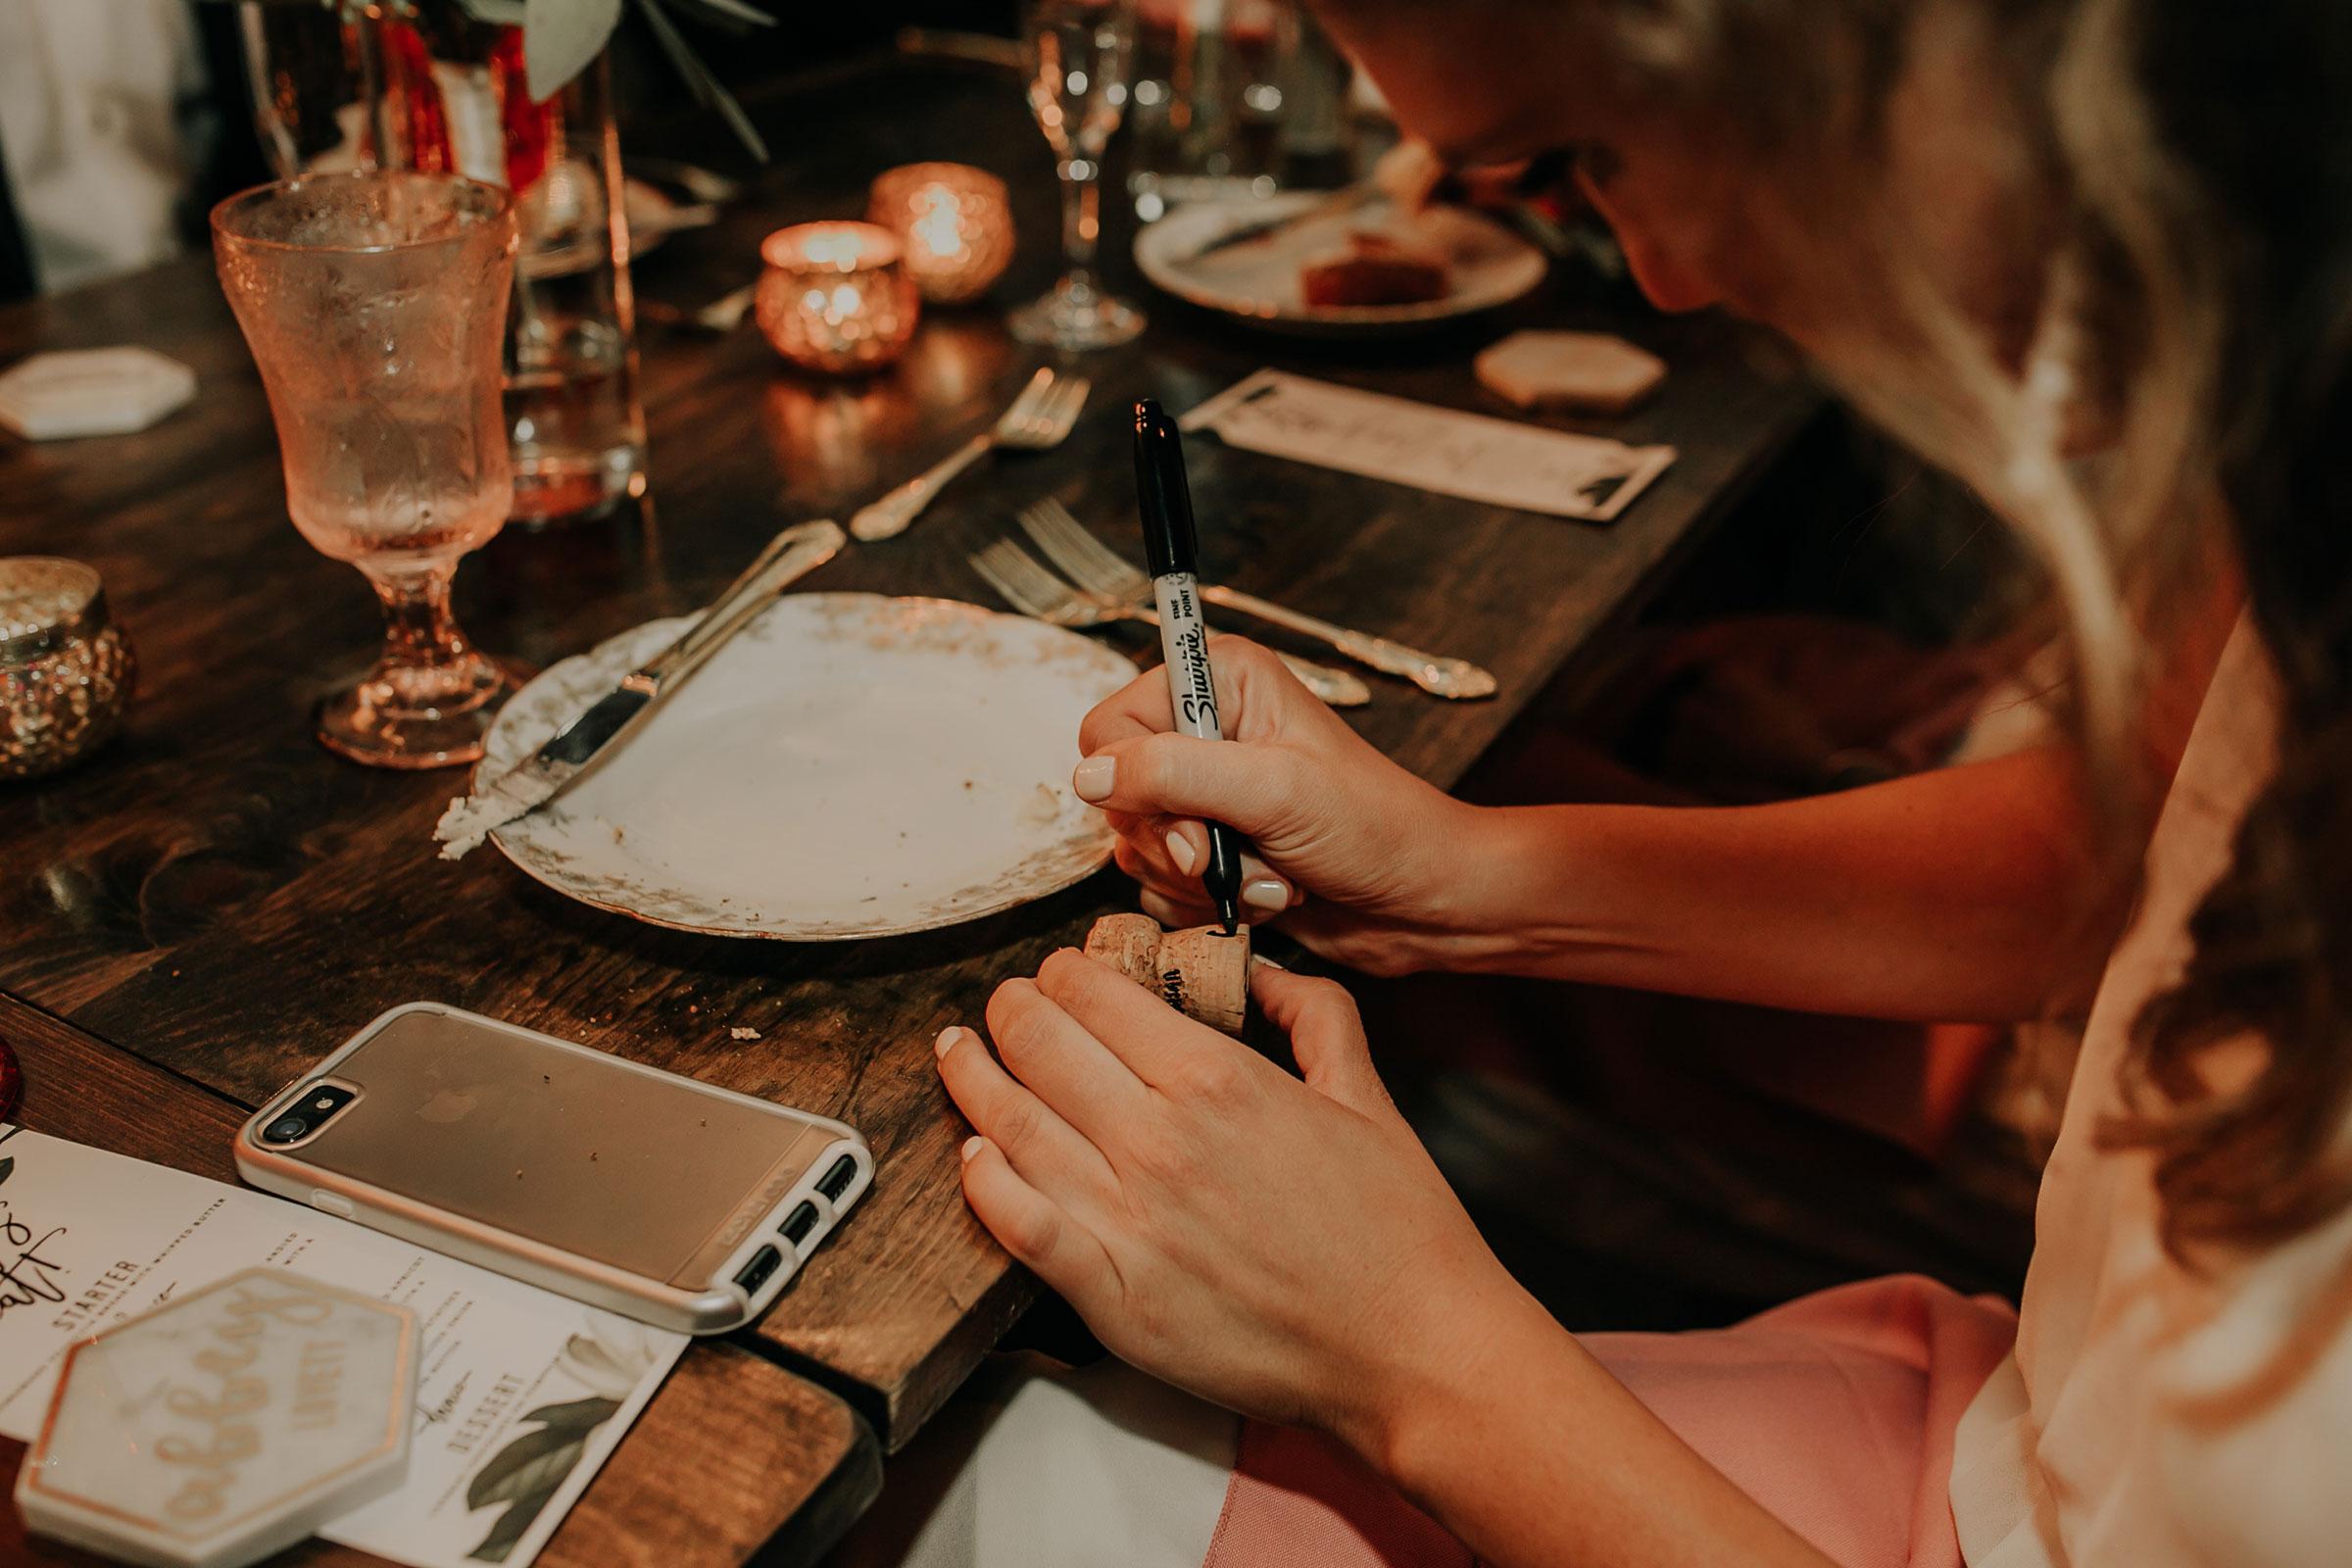 bridesmaid-signing-cork-for-wedding-couple-founders-one-nine-omaha-nebraska-raelyn-ramey-photography.jpg